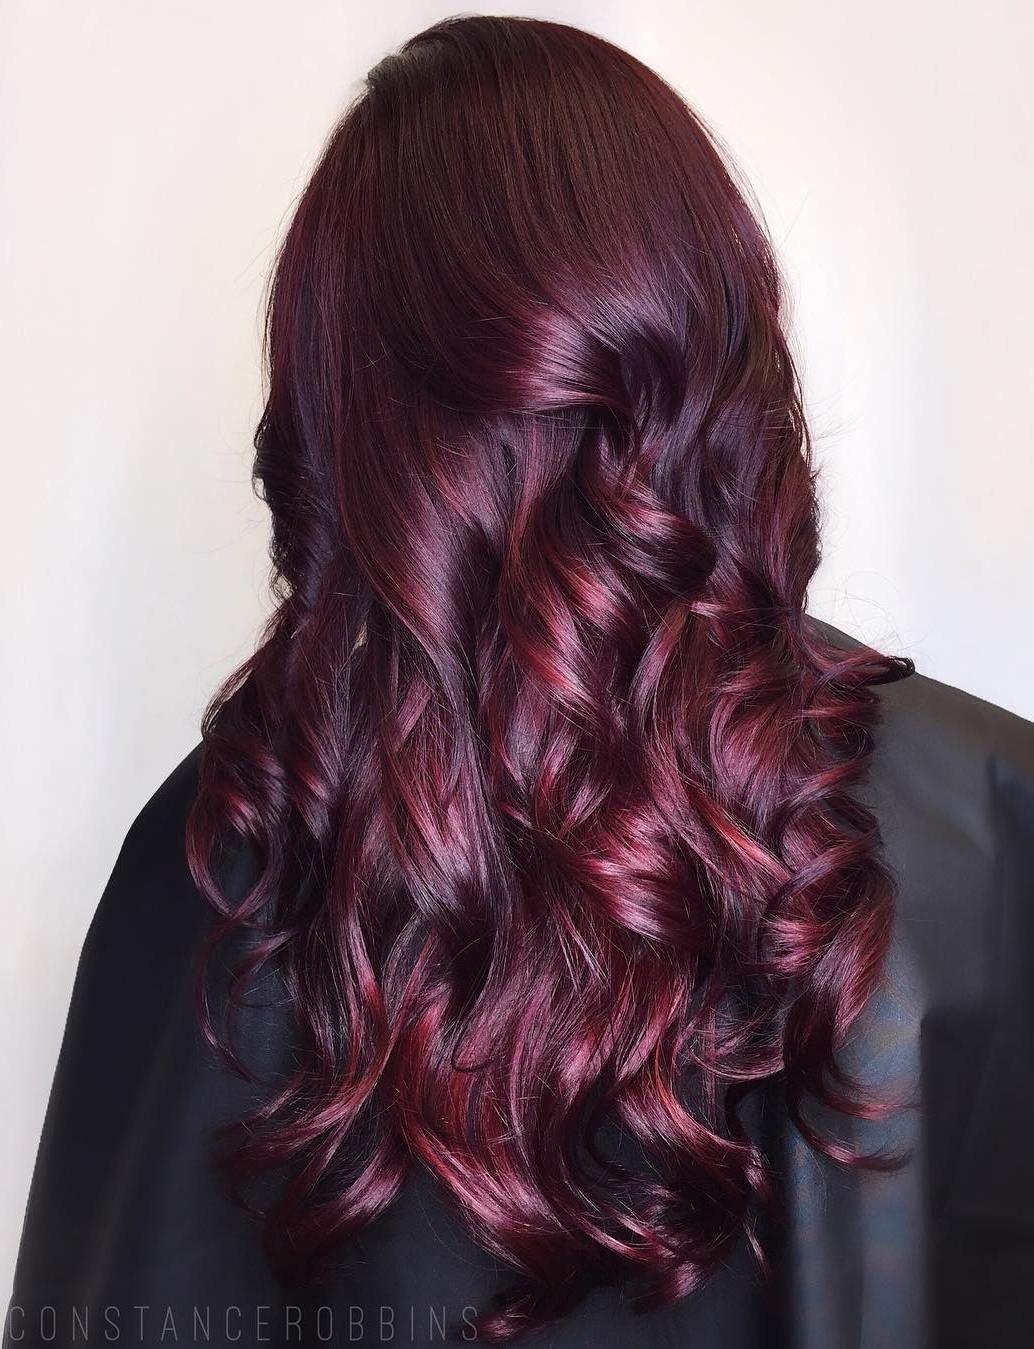 45 Shades of Burgundy Hair: Dark Burgundy, Maroon ...